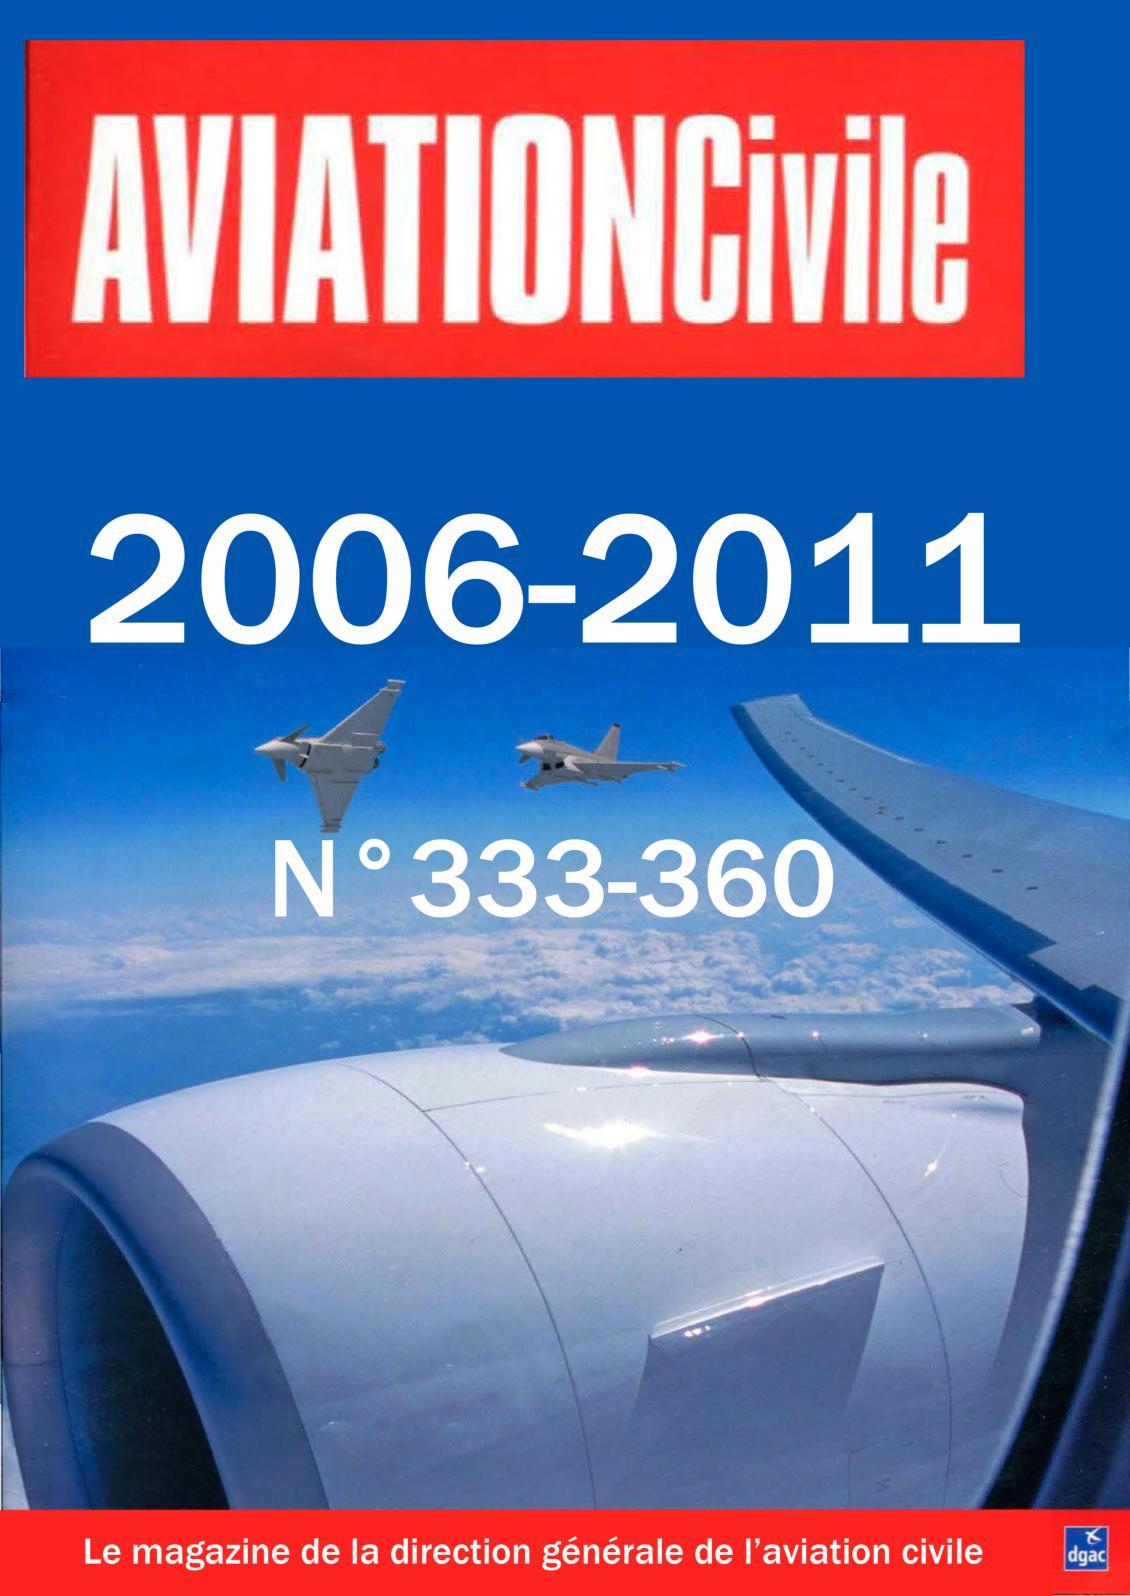 Calaméo - 2006 2011 Aviation Civile 333 360 93de2dd962ad